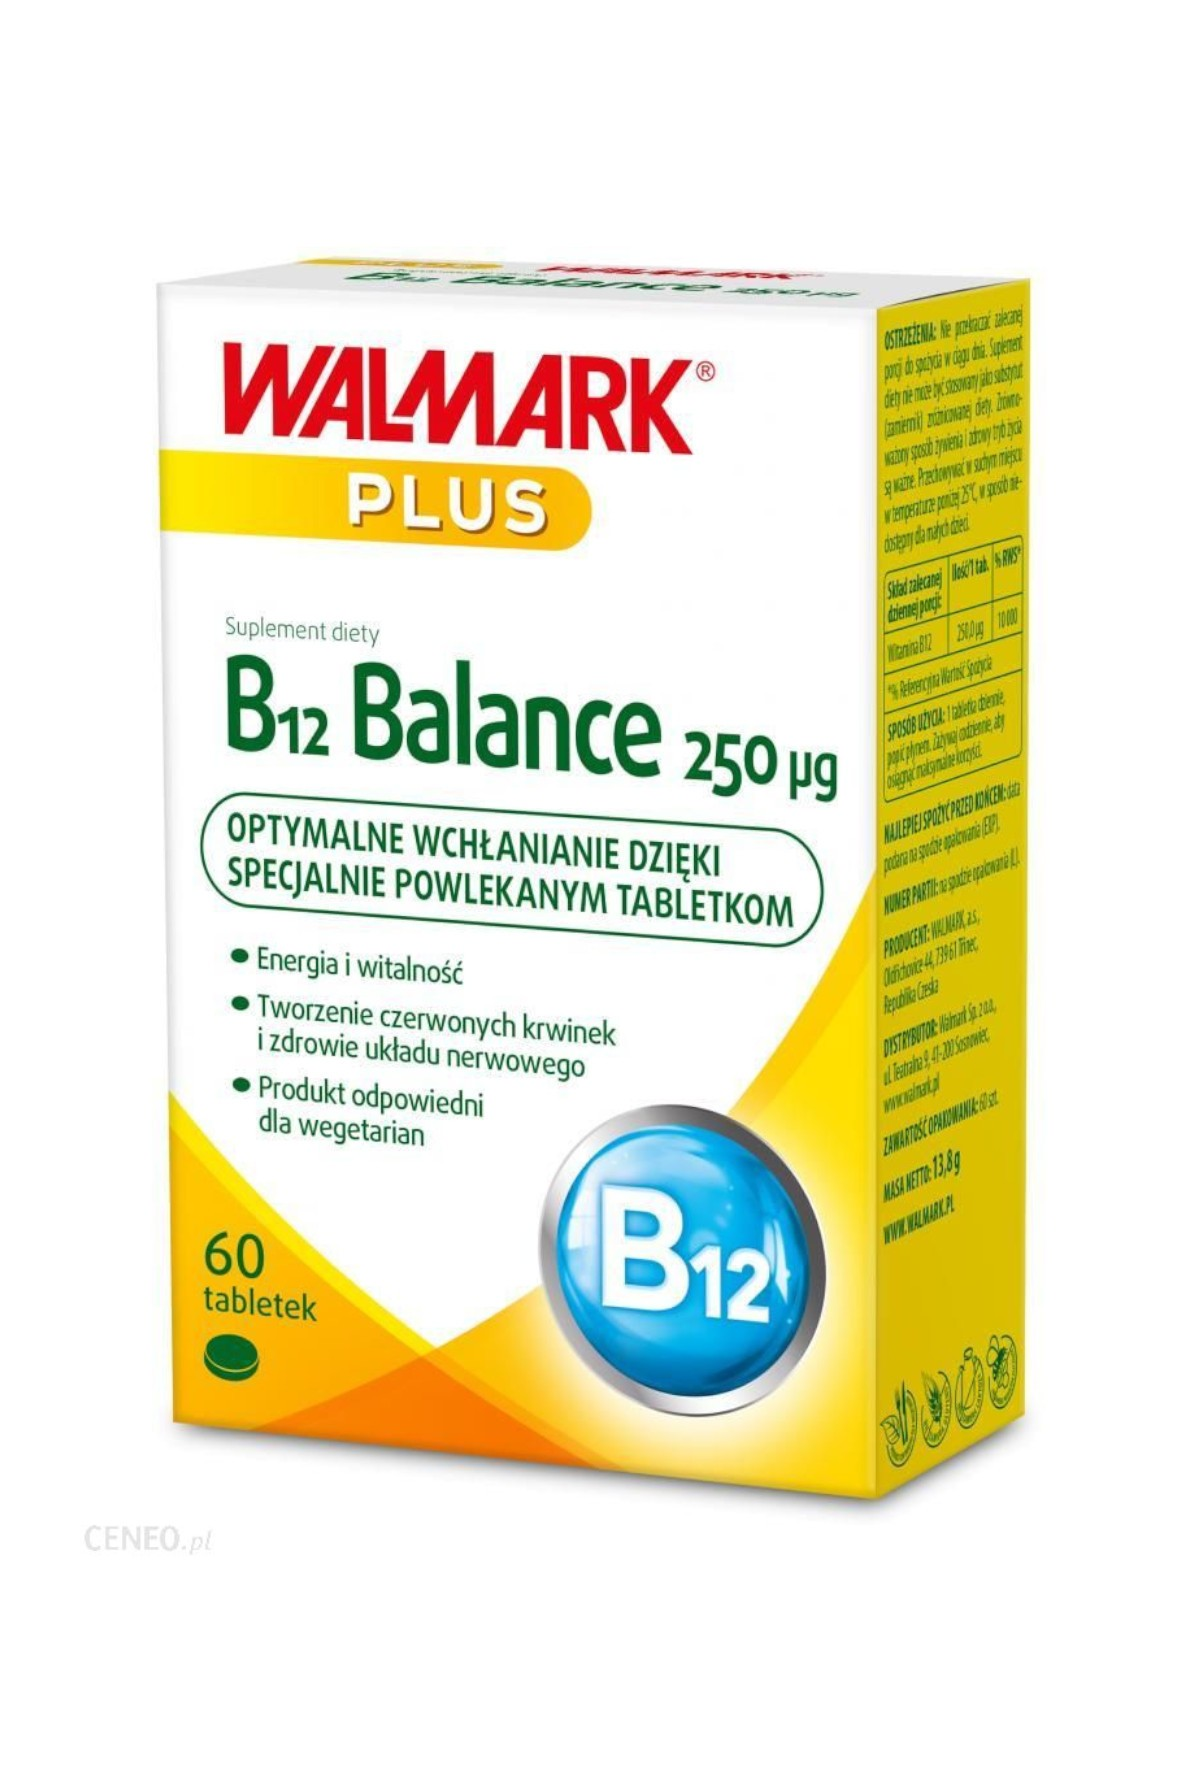 B 12 balance 250 µg suplementy diety - 60 tabletek